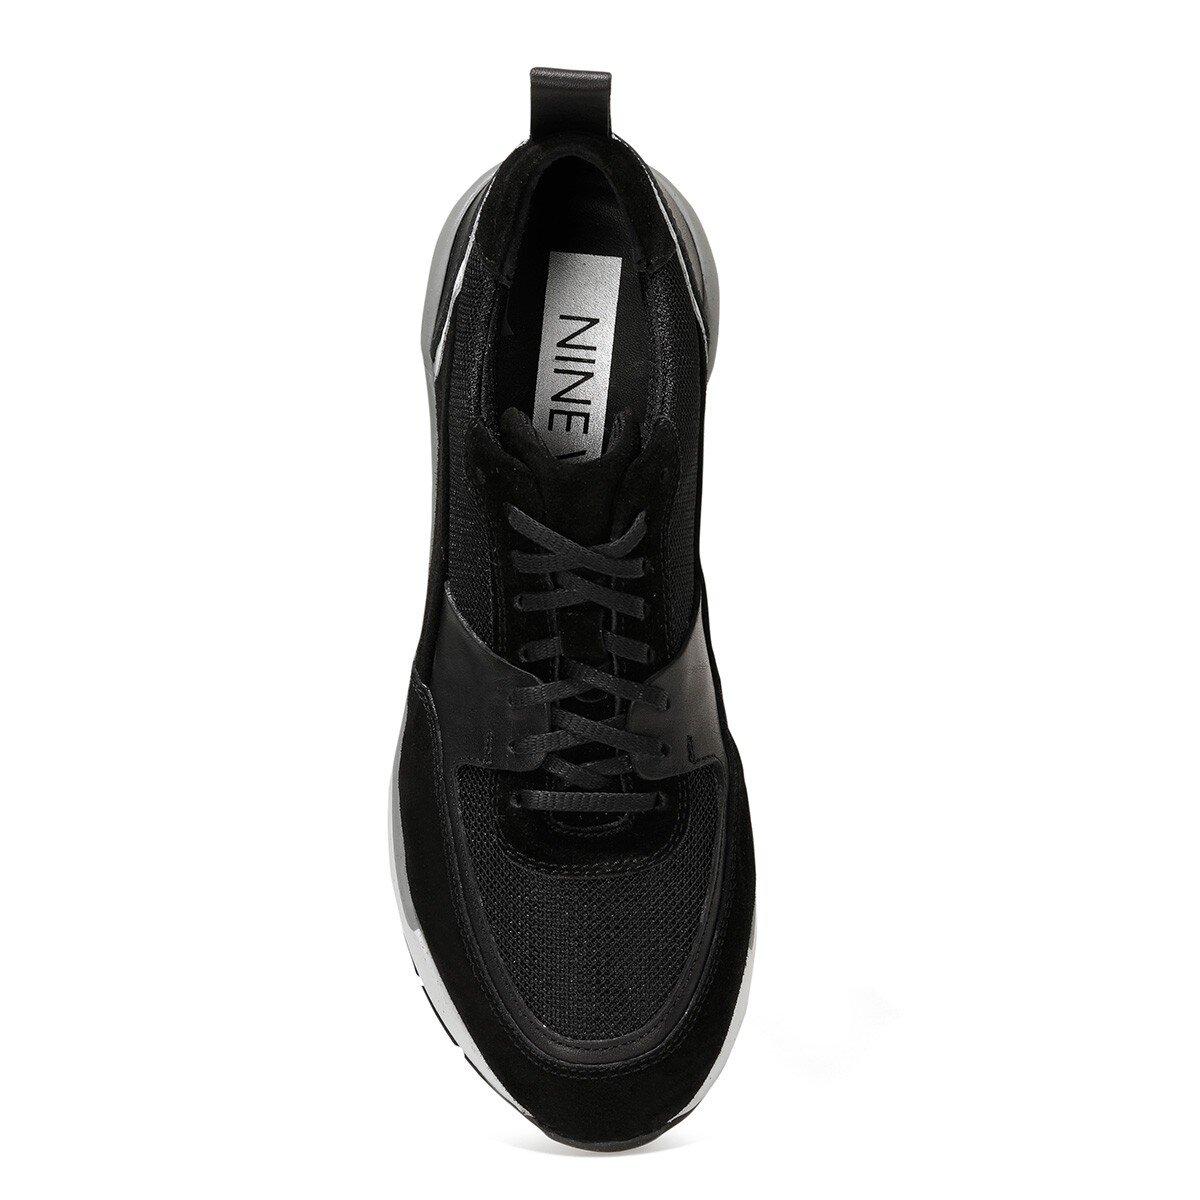 BEMAL 1FX Siyah Erkek Casual Ayakkabı